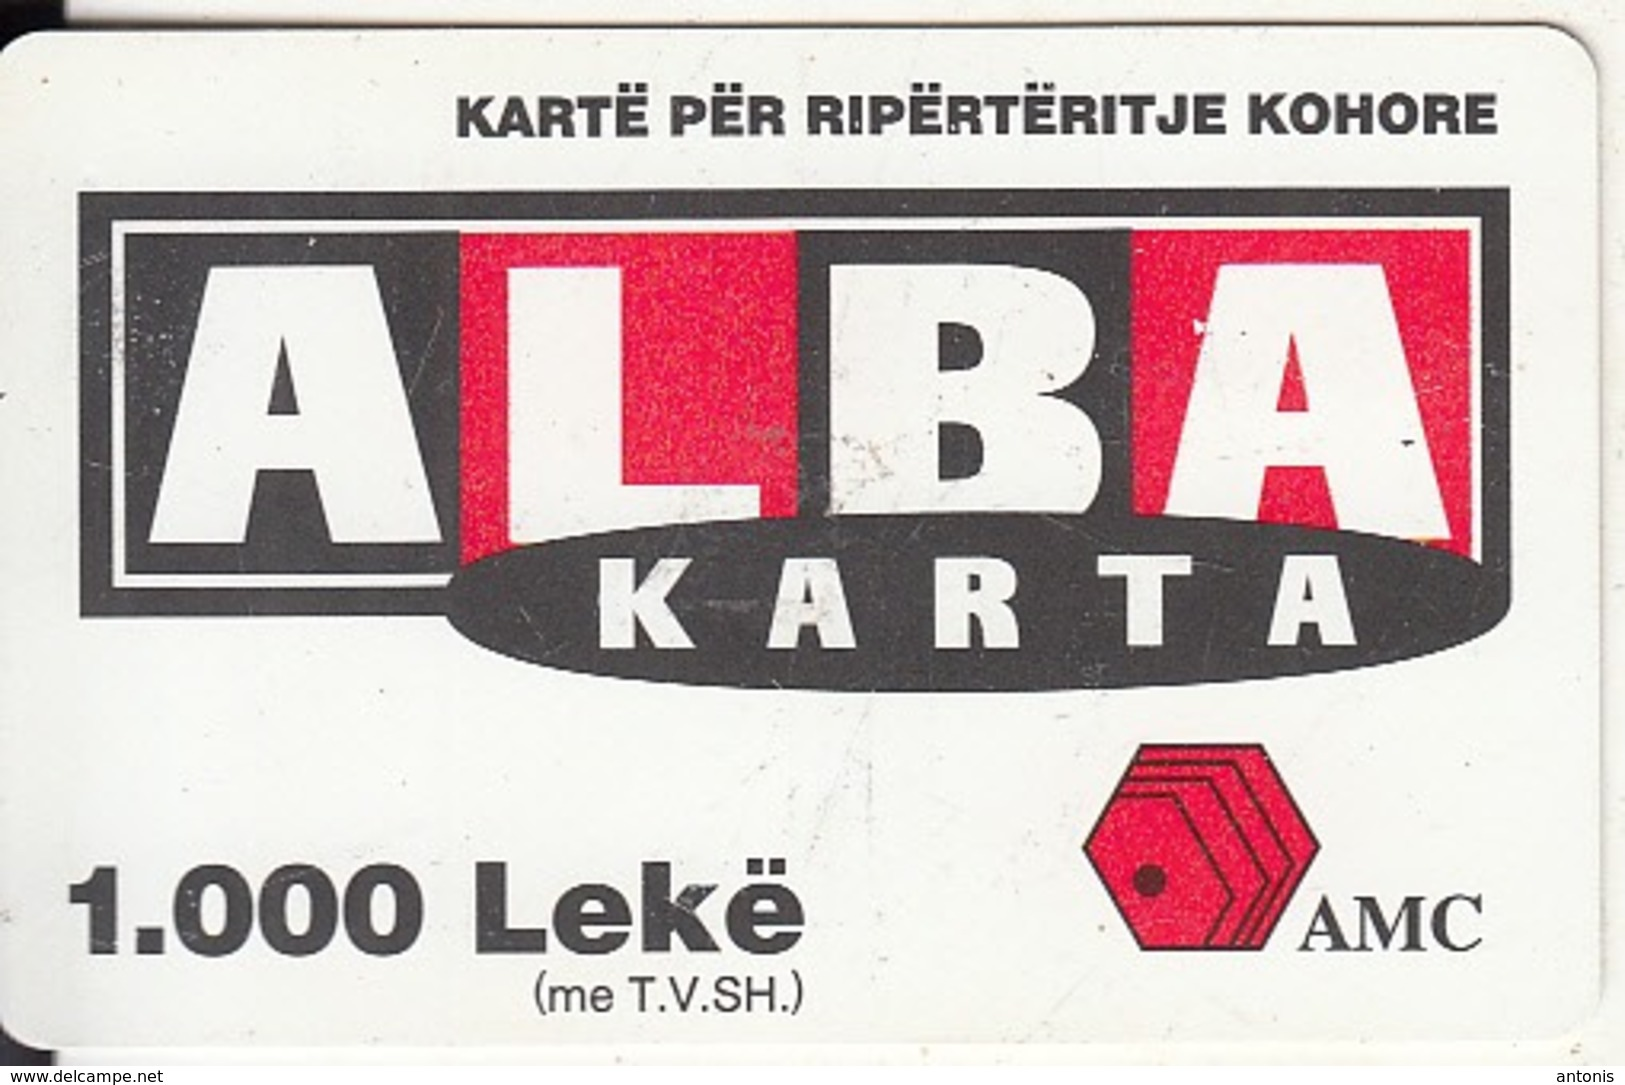 ALBANIA - ALBA Karta, AMC Prepaid Card 1000 Leke, Exp.date 22/04/04, Used - Albanie